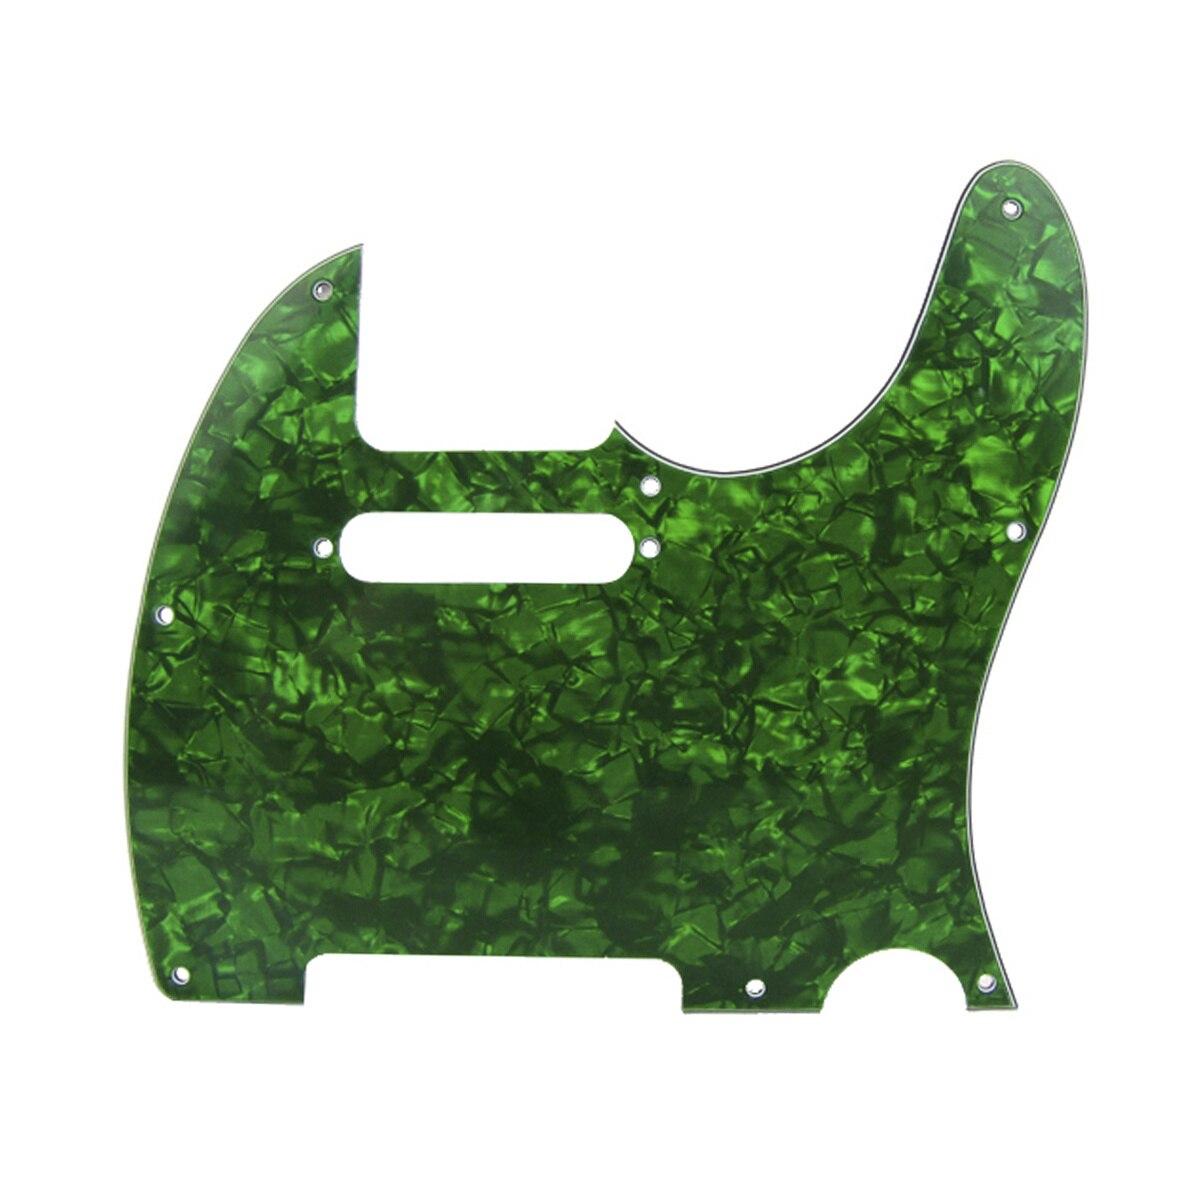 Musiclili 8 agujero Tele guitarra Pickguard para EE. UU./Fender hecho mexicano estándar Telecaster estilo moderno, 4Ply perla verde